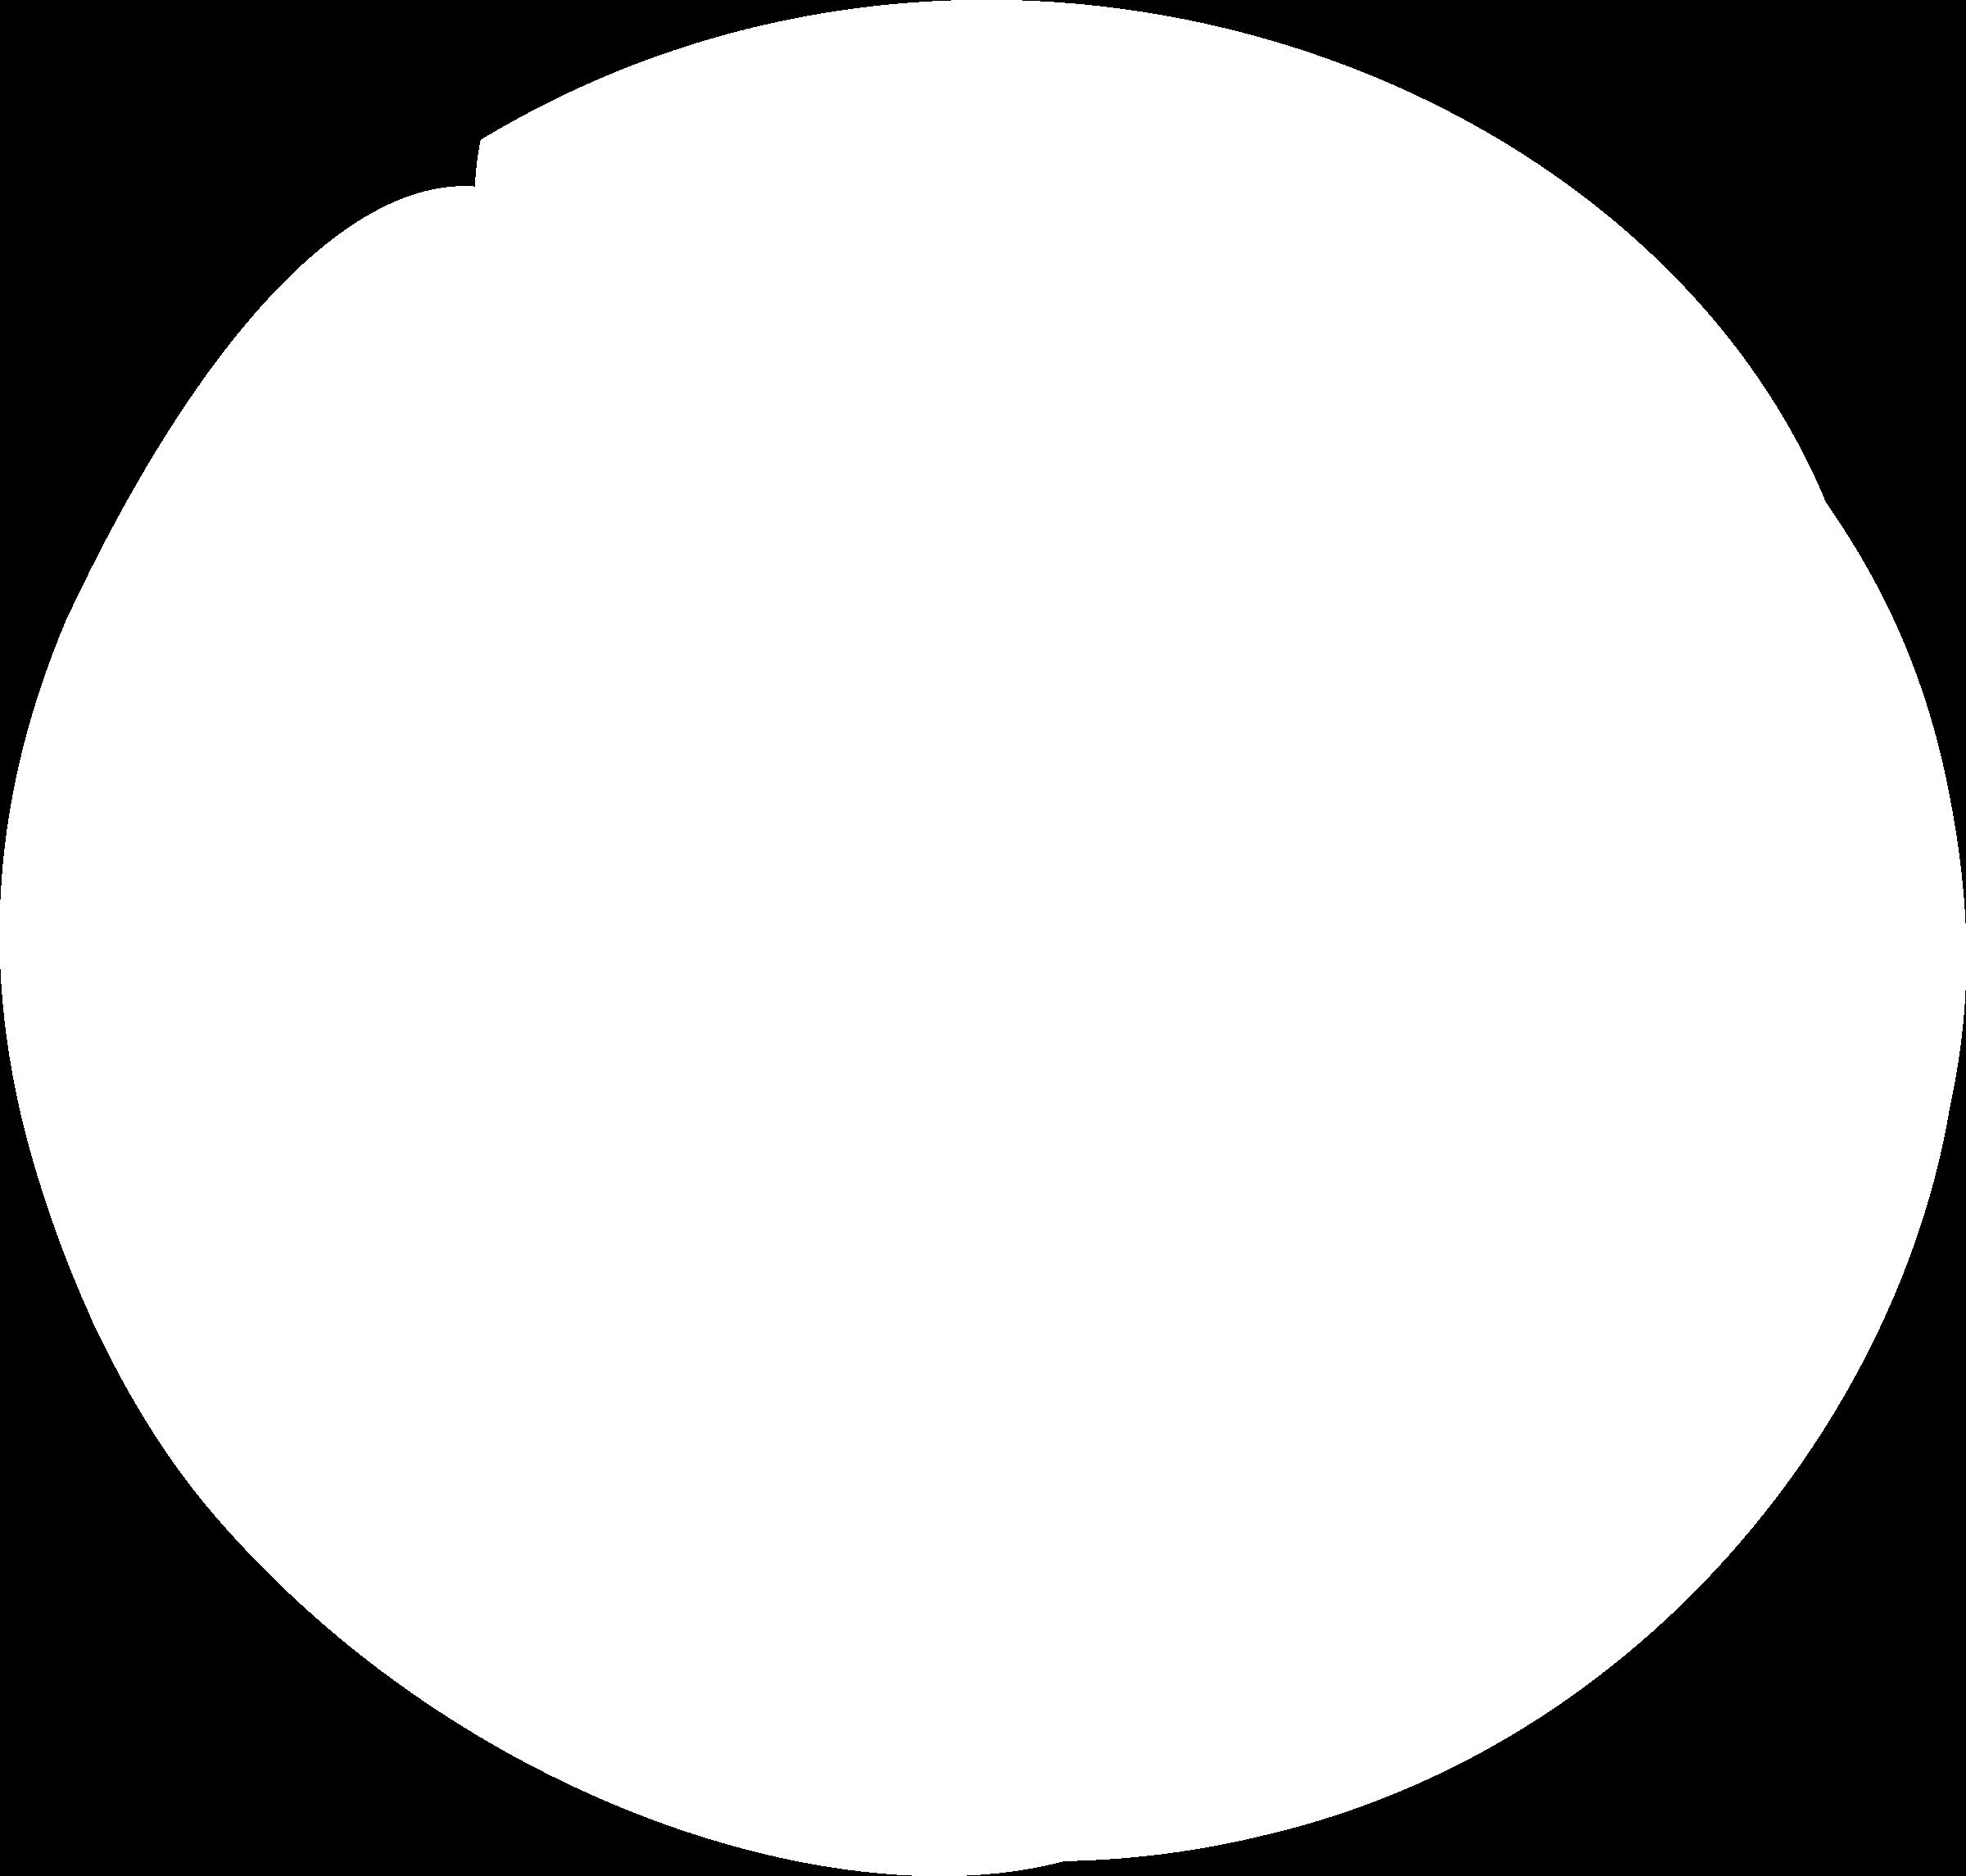 Black And White Google: Google Chrome Logo PNG Transparent & SVG Vector